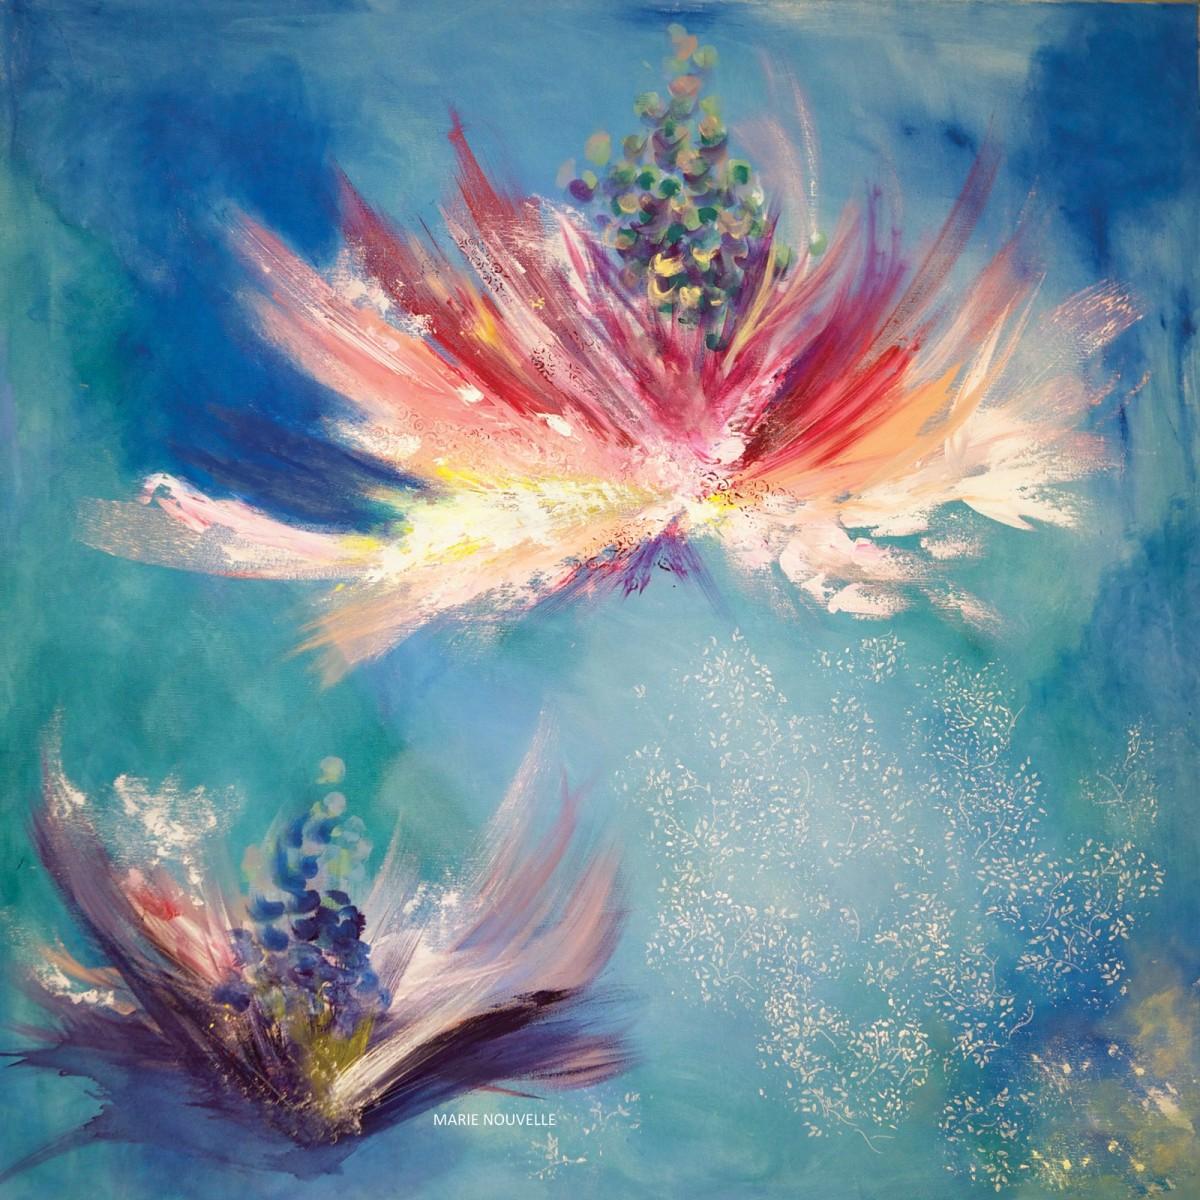 Foulard en soie Flowers Whispers Marie Nouvelle image 2